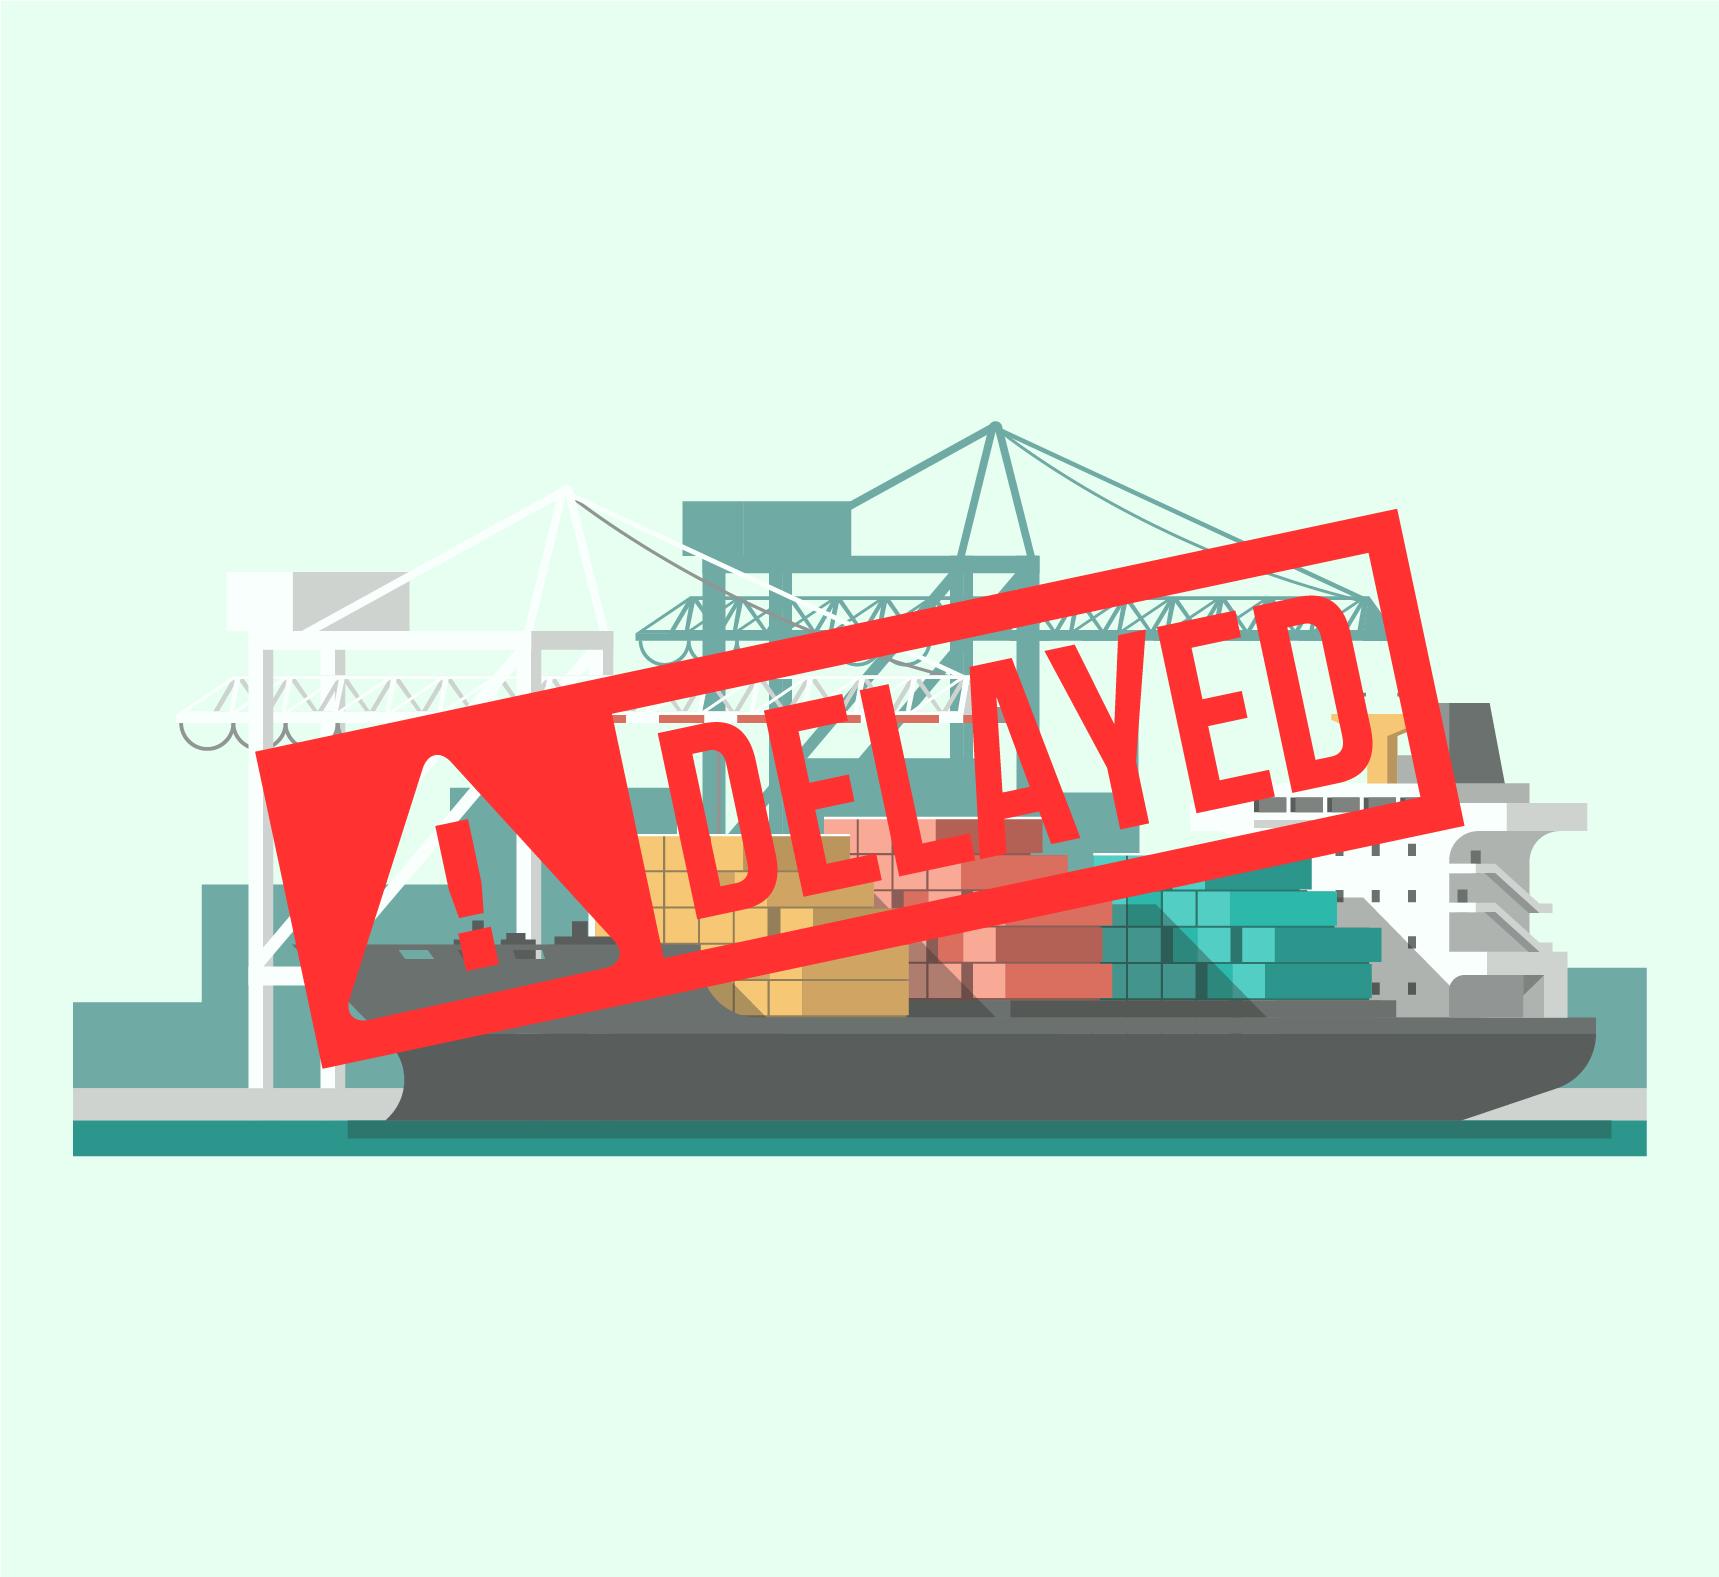 Warning!!!: Shipping delays will impact Christmas!!!